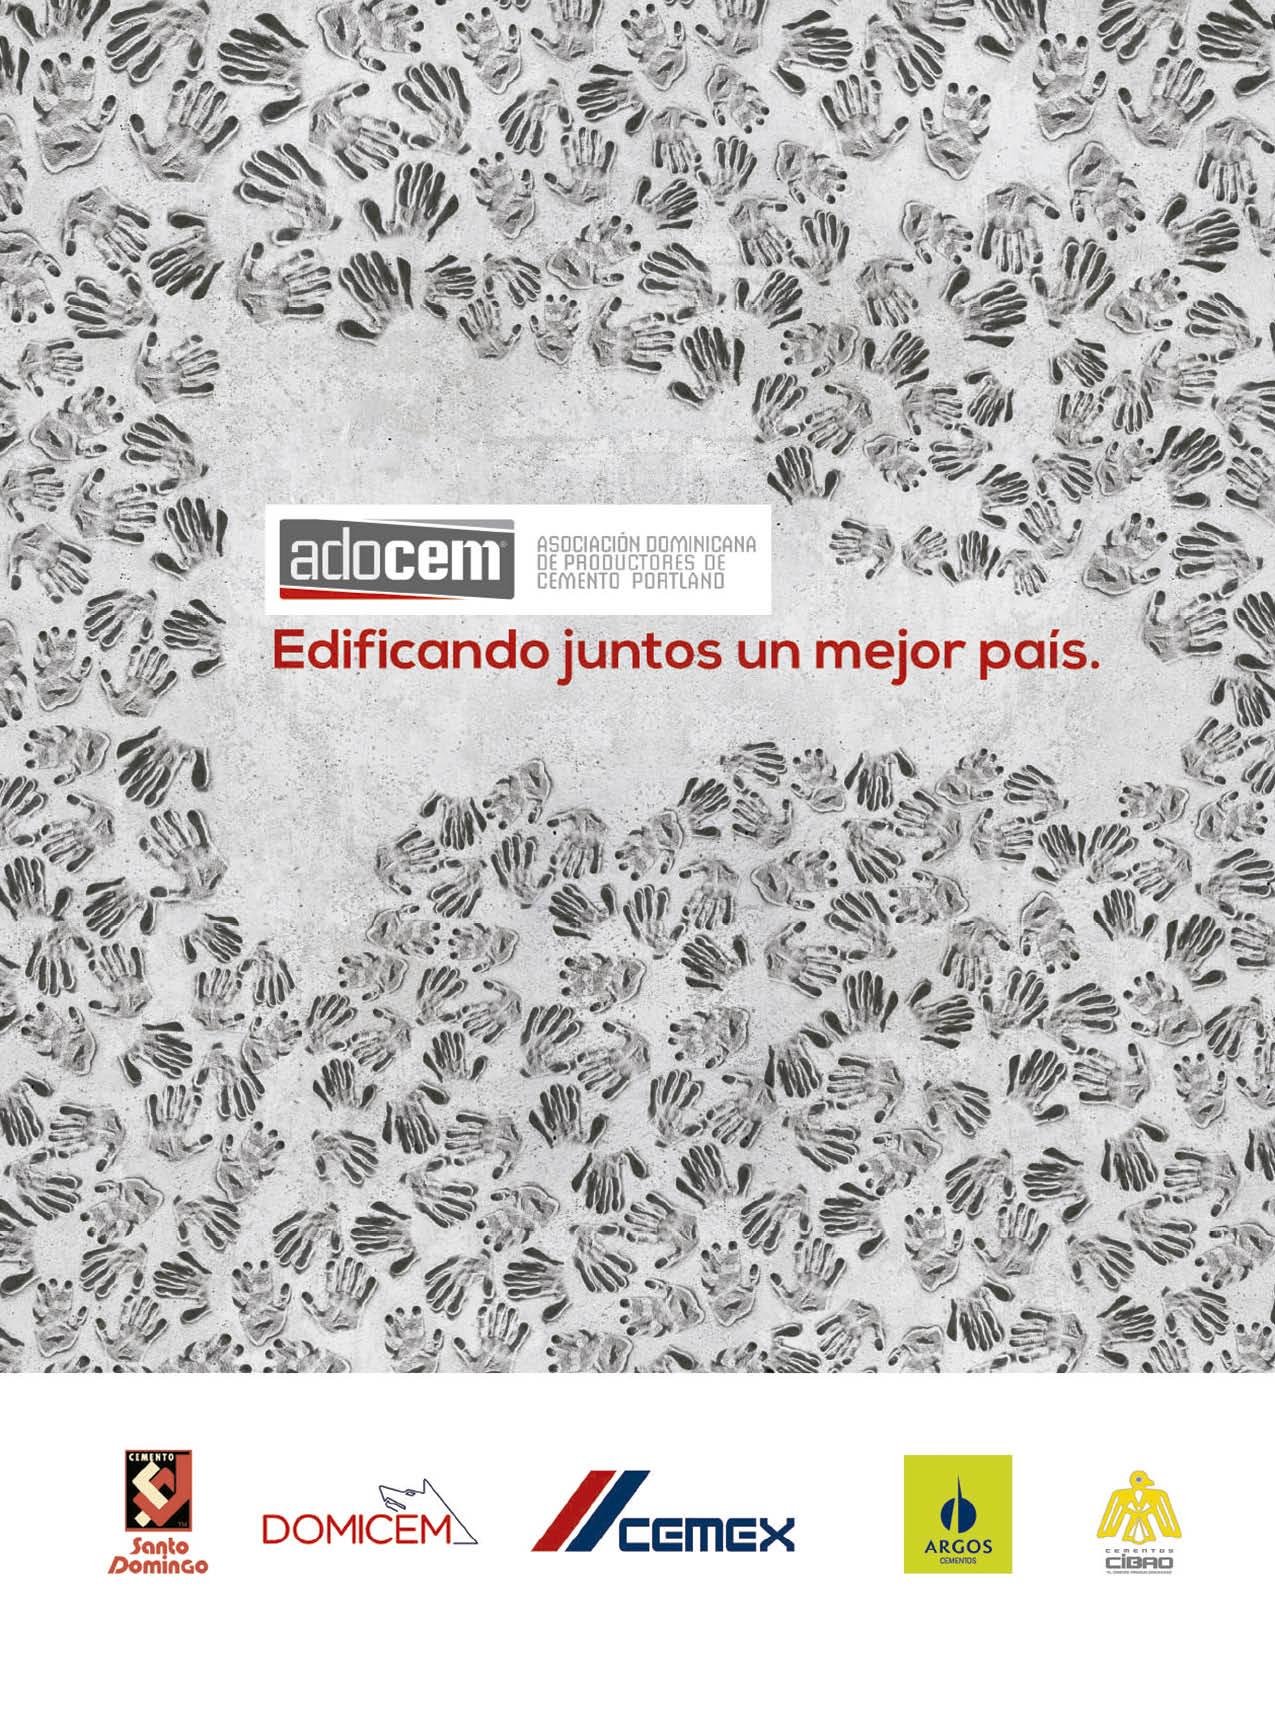 Asociación Dominicana de Productores de Cemento Portland